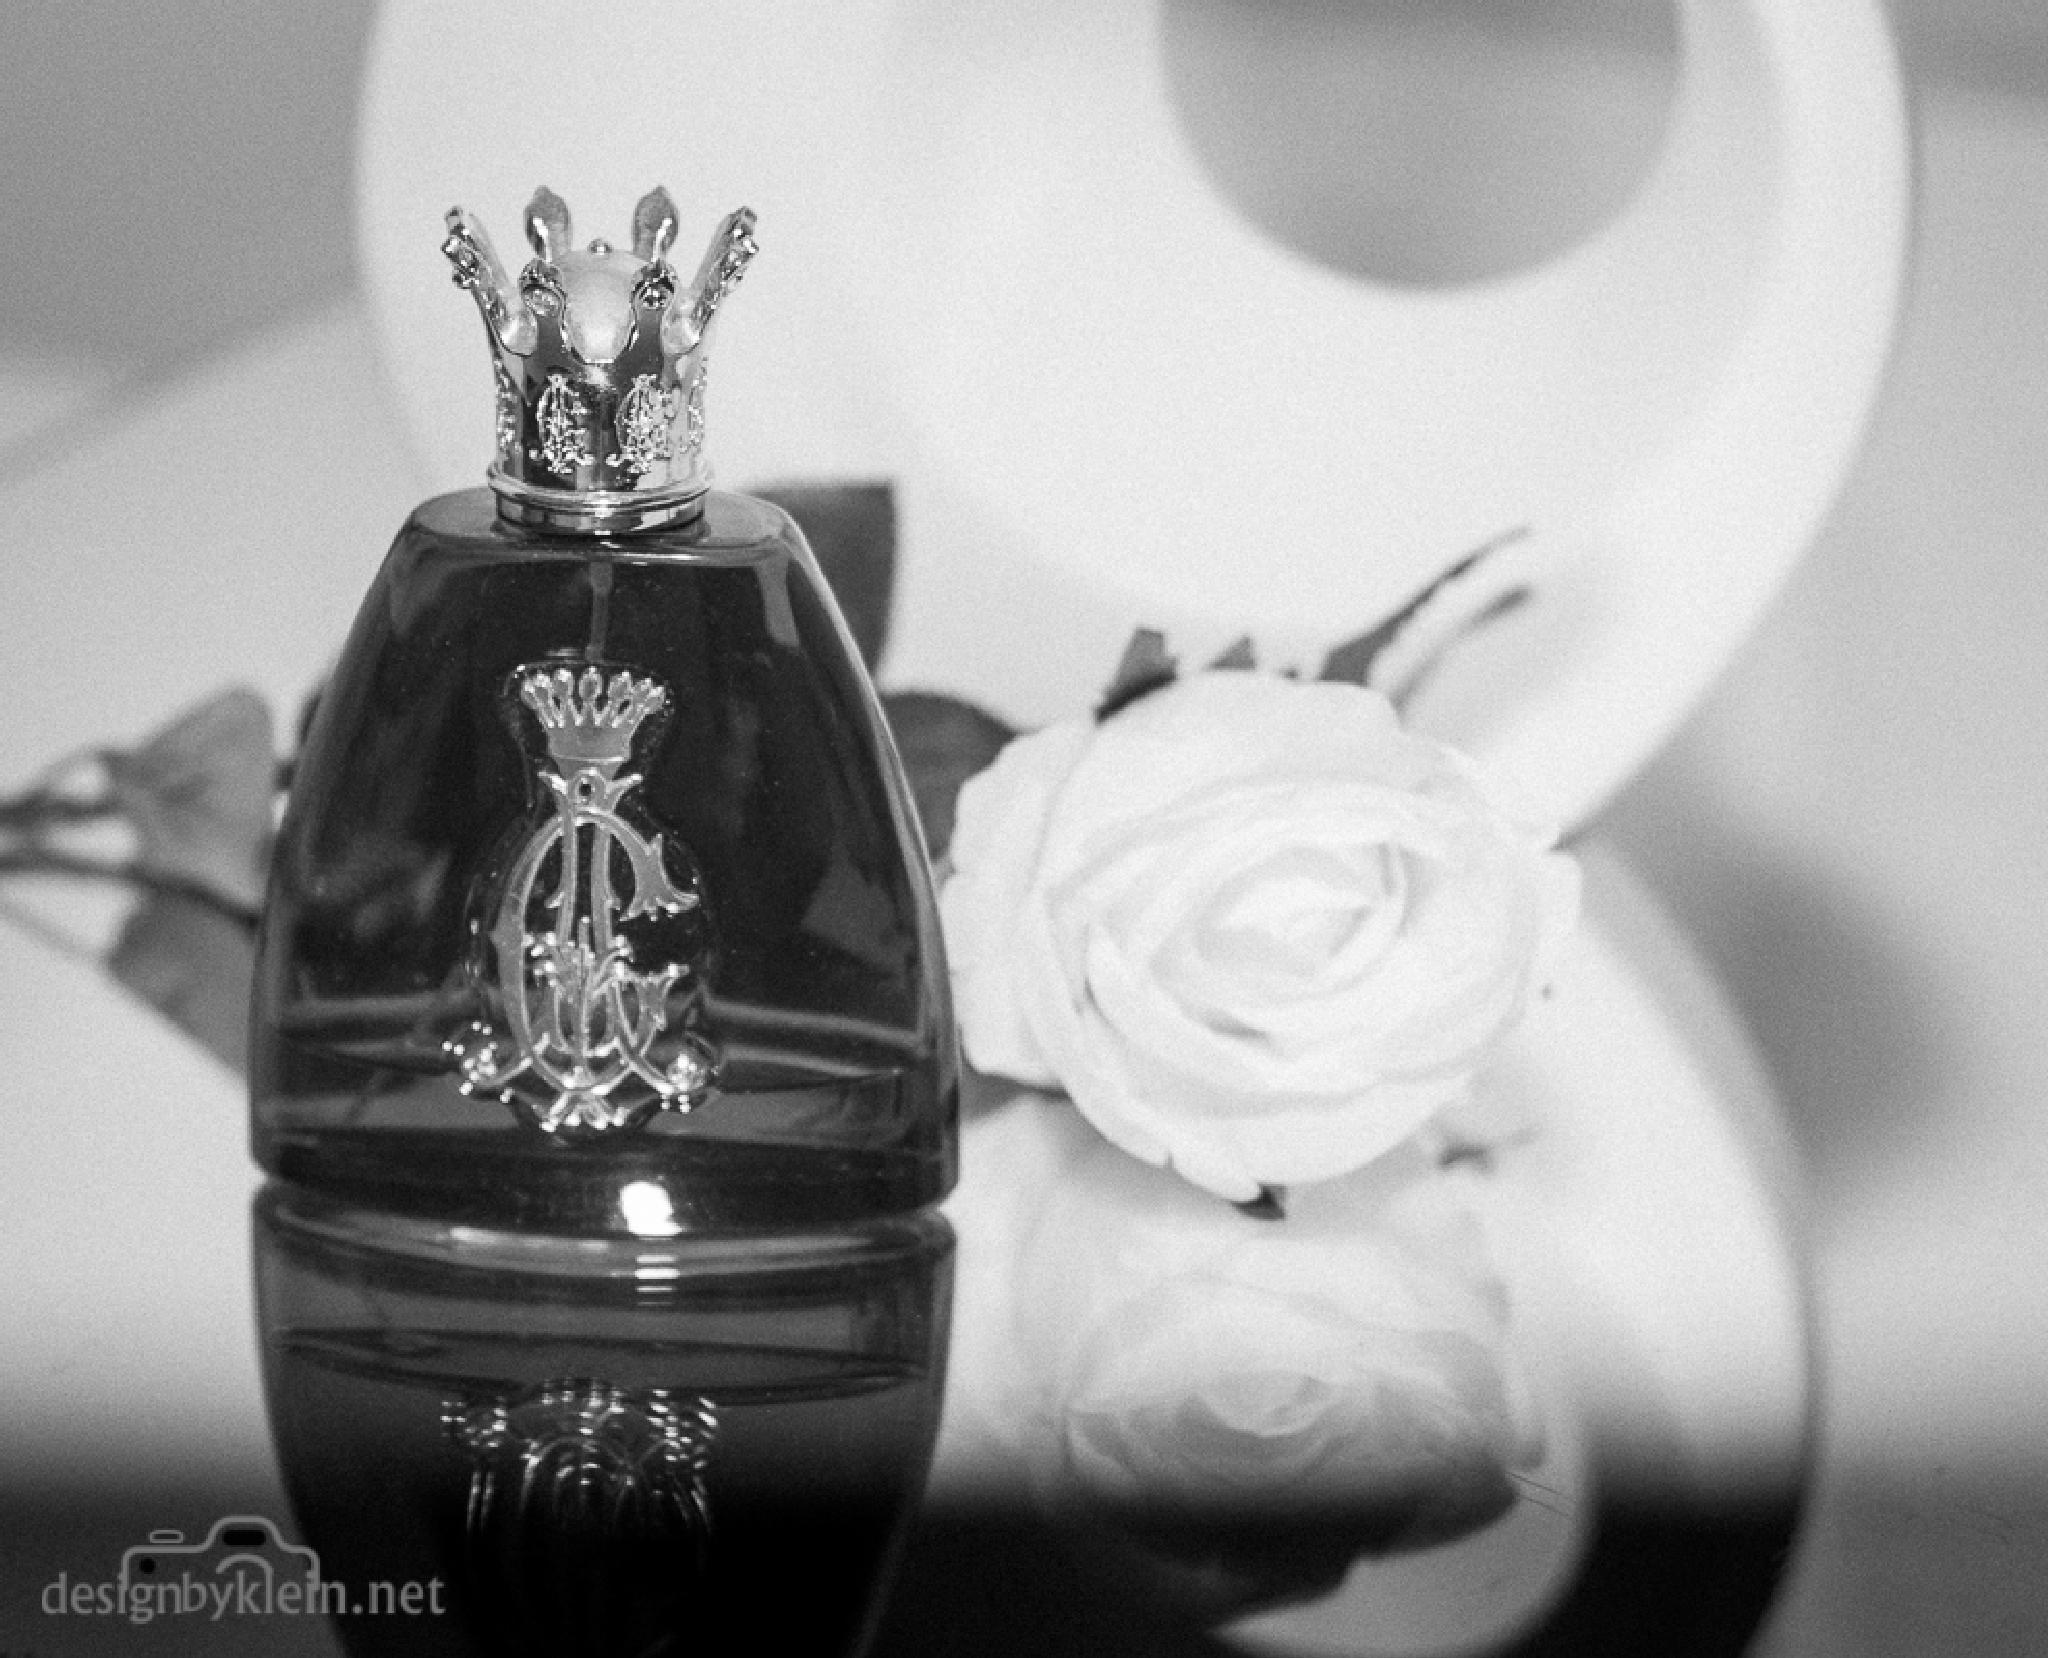 Christian Audigier Perfume by designbyklein.net  by designbyklein! fine art photographer!